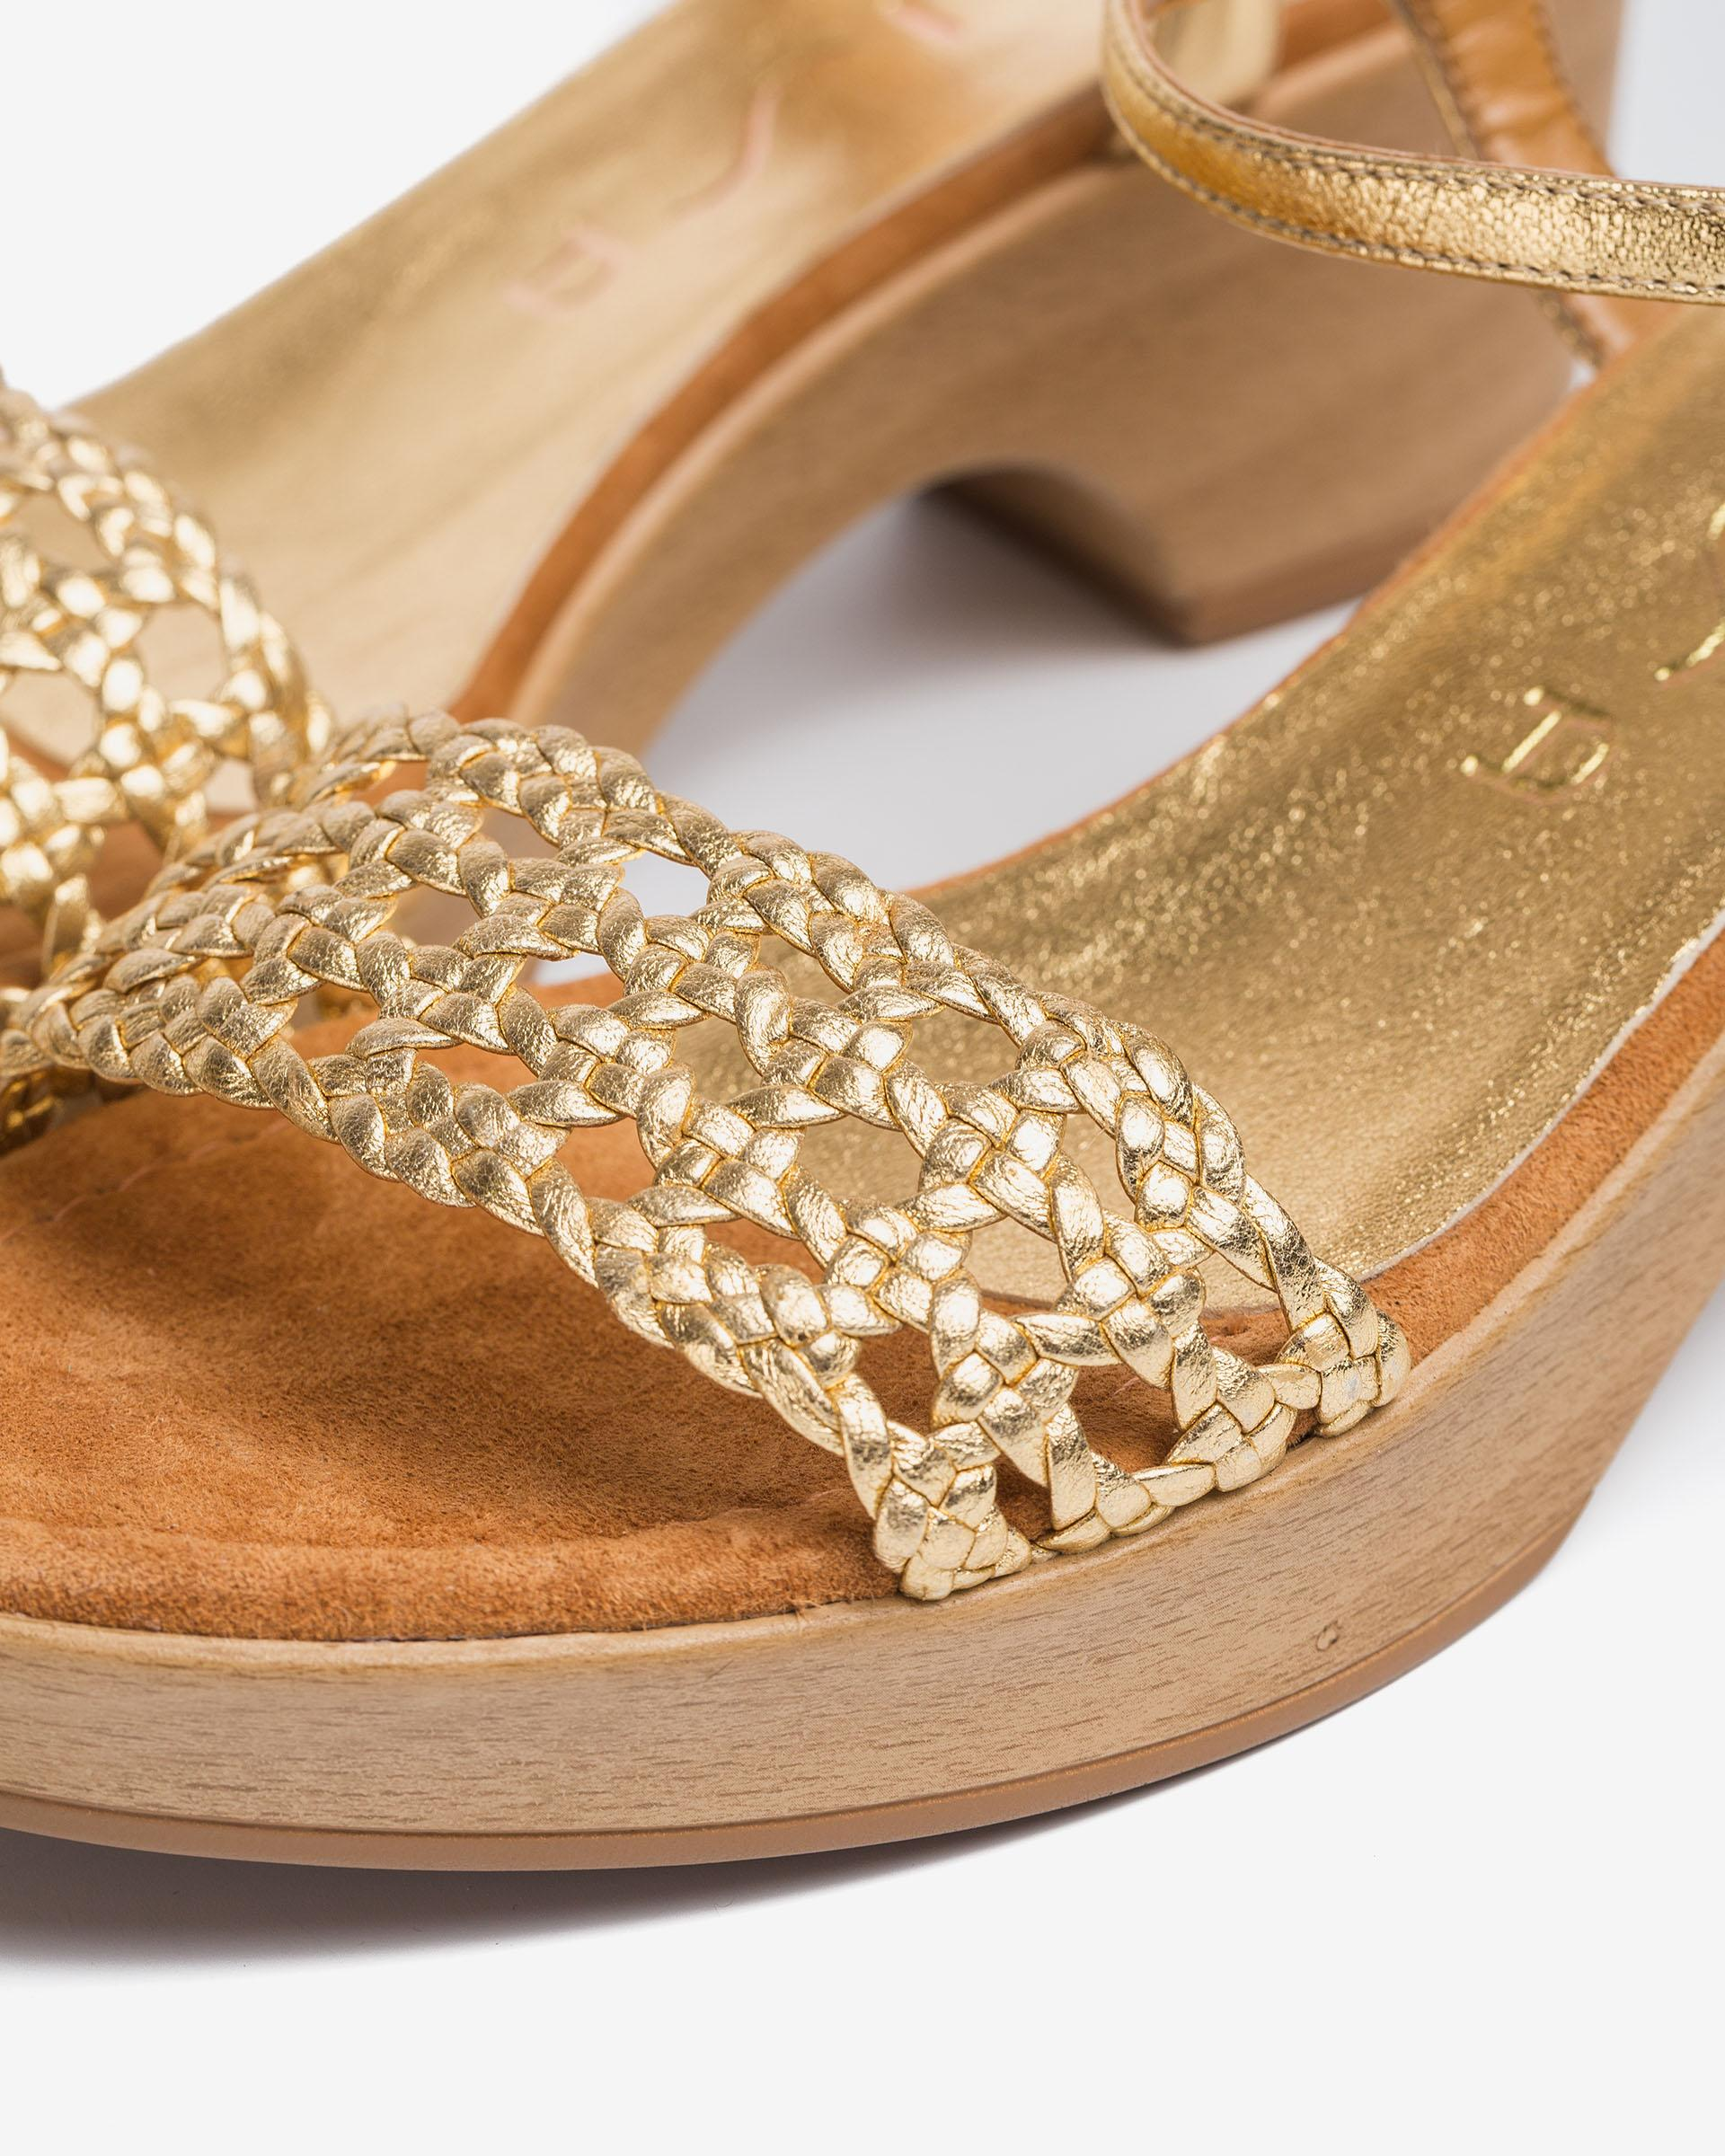 UNISA Metal effect leather braided sandals ILOBI_21_LMT 2